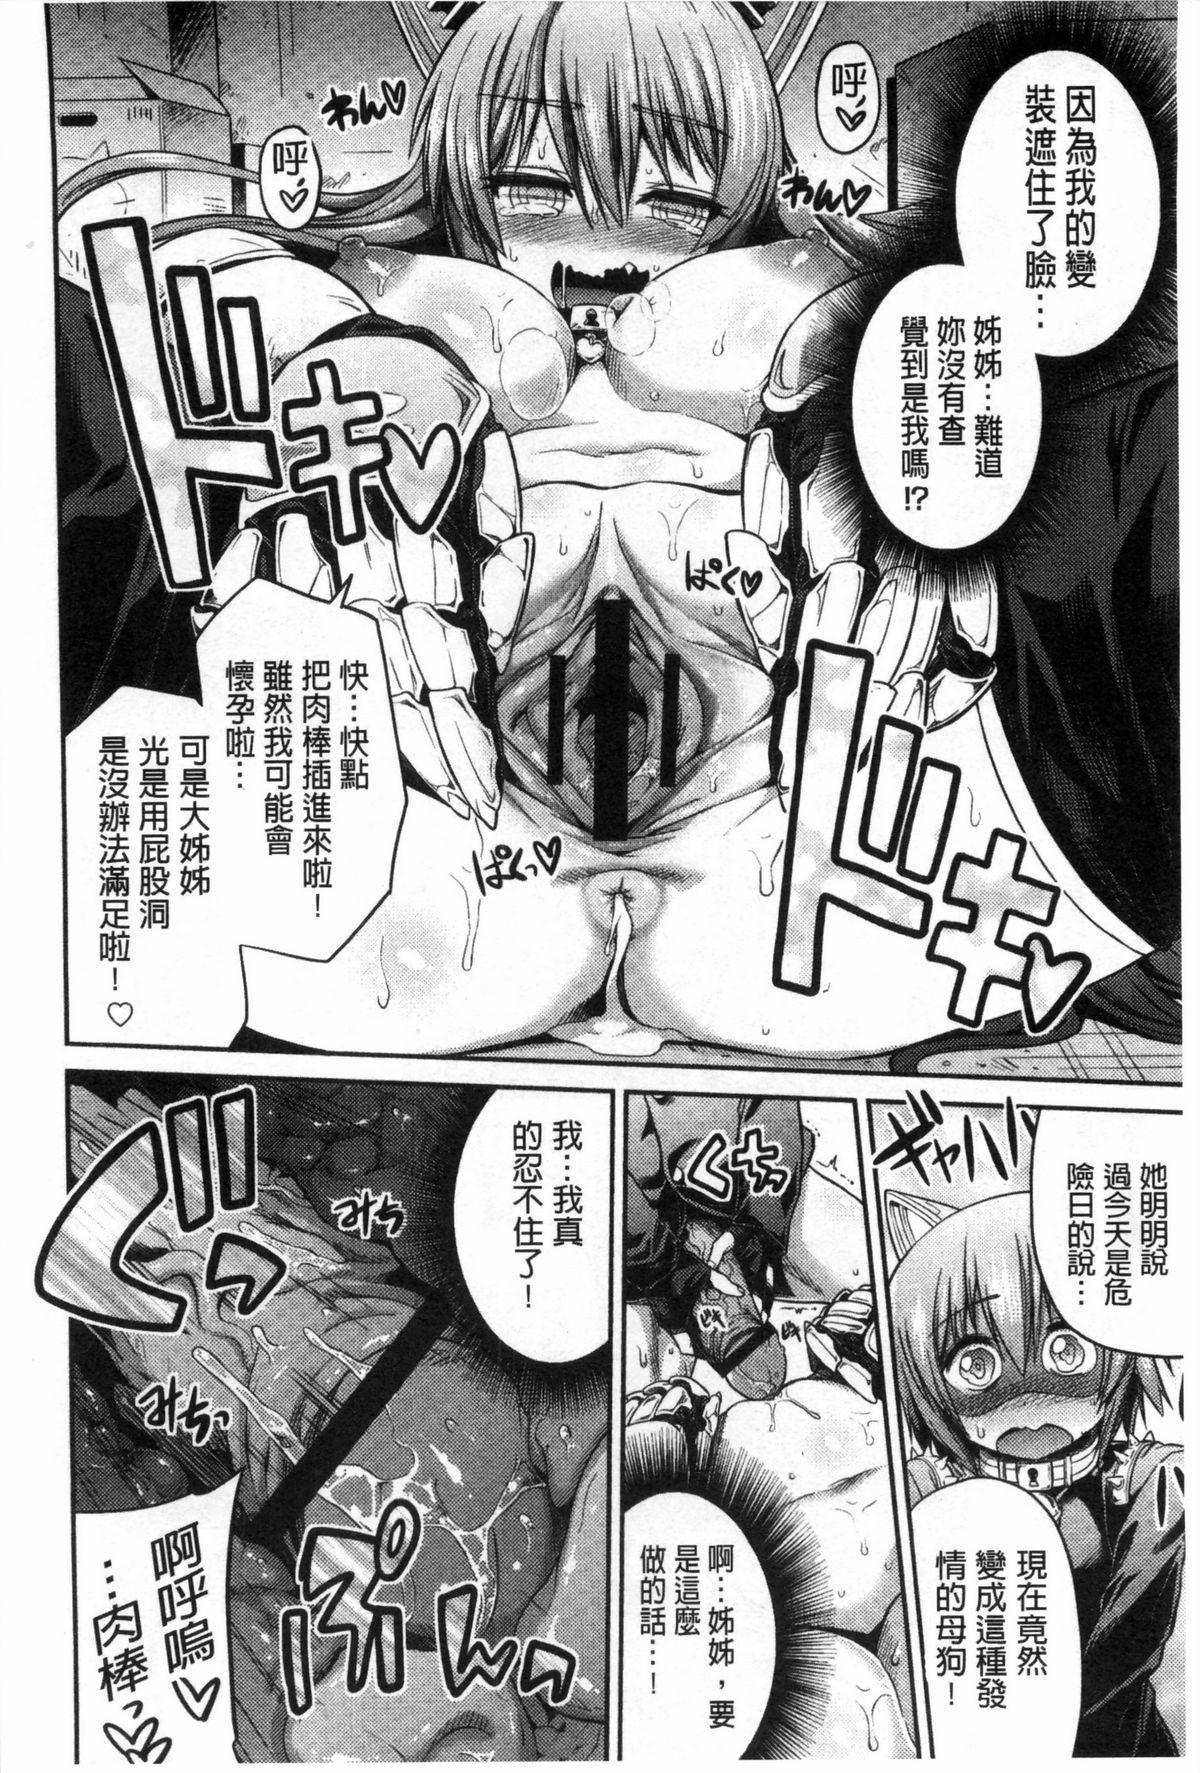 Man x Koi - Ero Manga de Hajimaru Koi no Plot   A漫×戀情 由情色漫畫所萌生的戀之物語 182